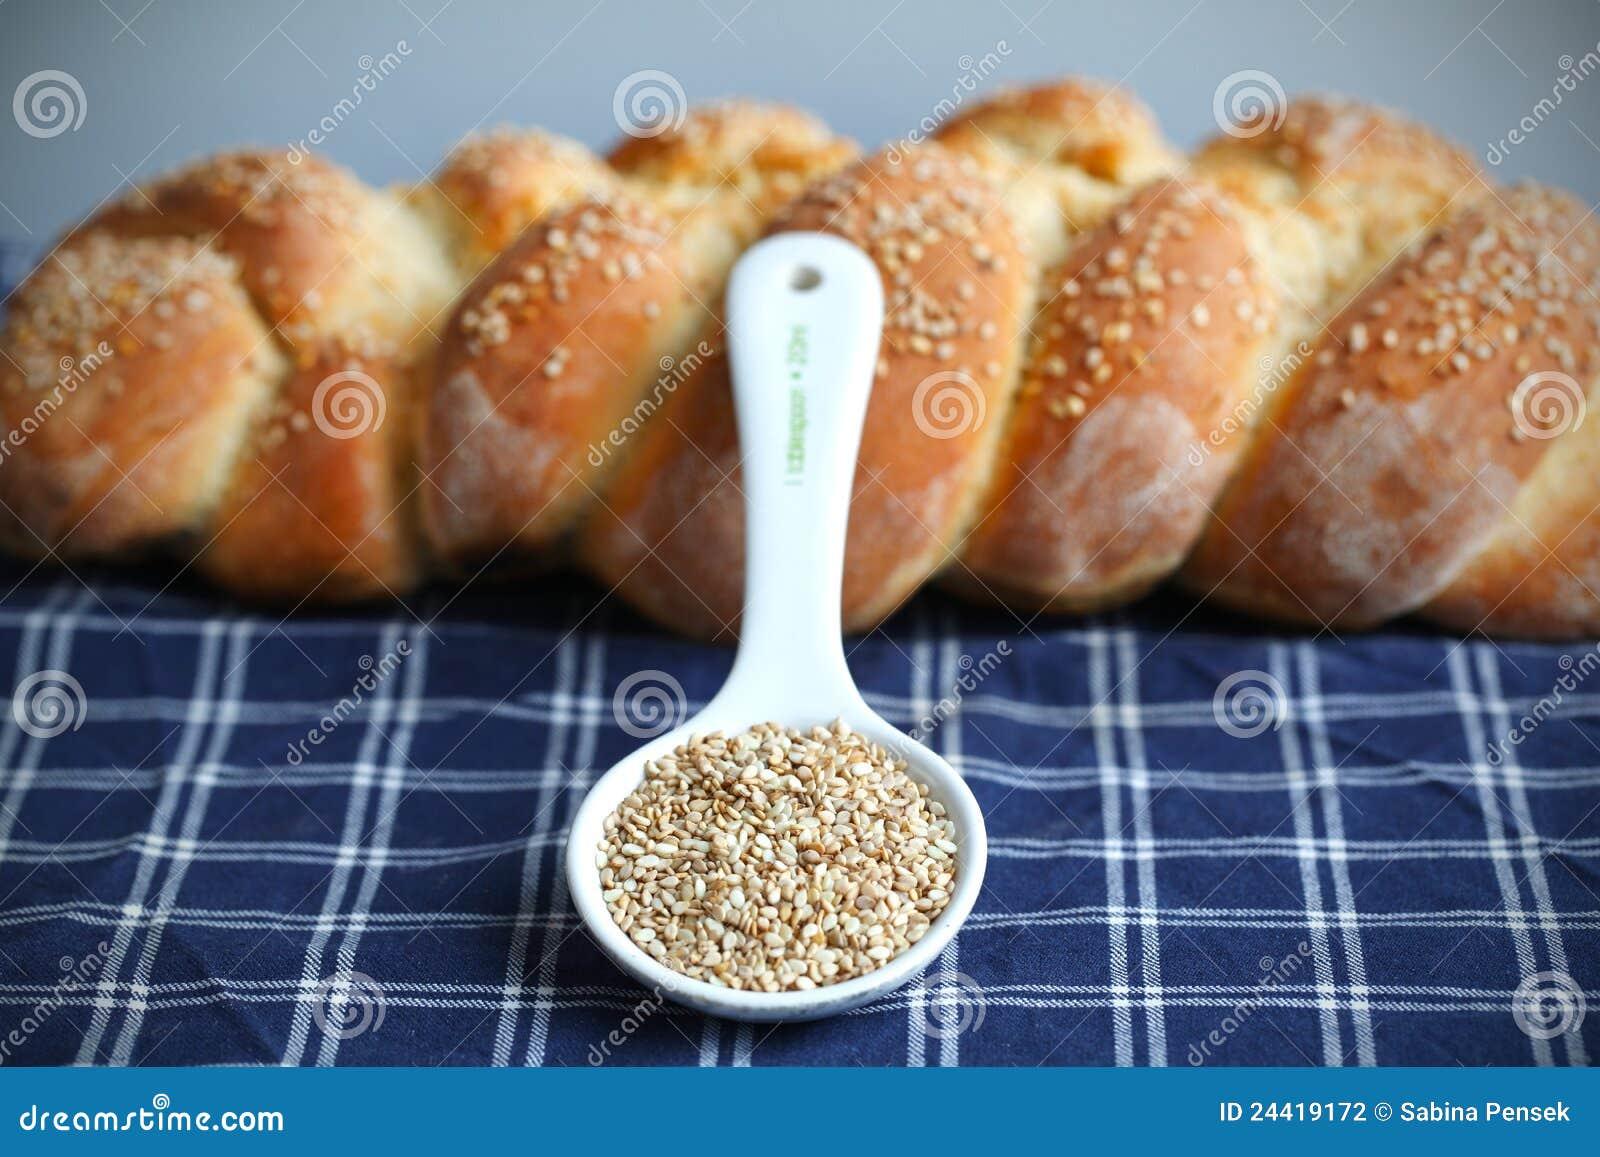 Sesam en gevlecht artisanaal broodbrood